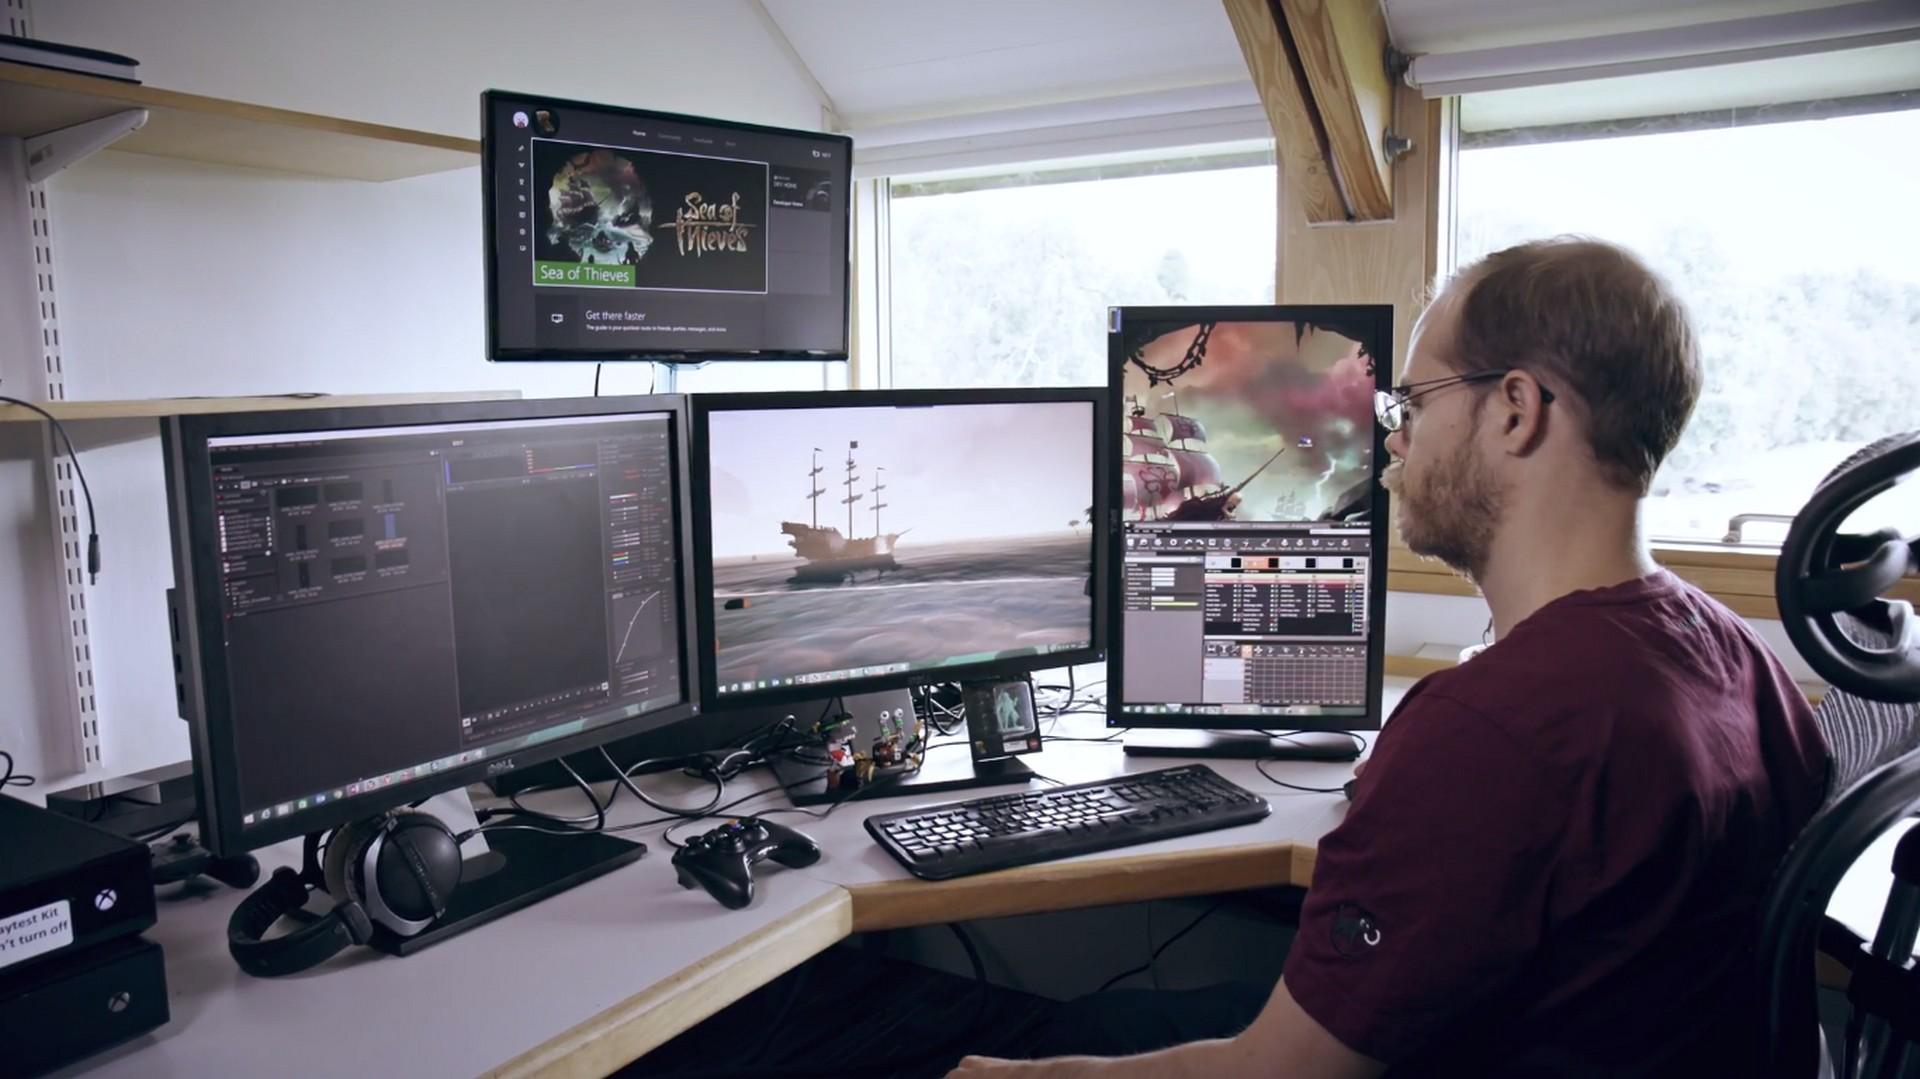 sea-of-thieves-nuovo-trailer-short-haul-1-gamesoul